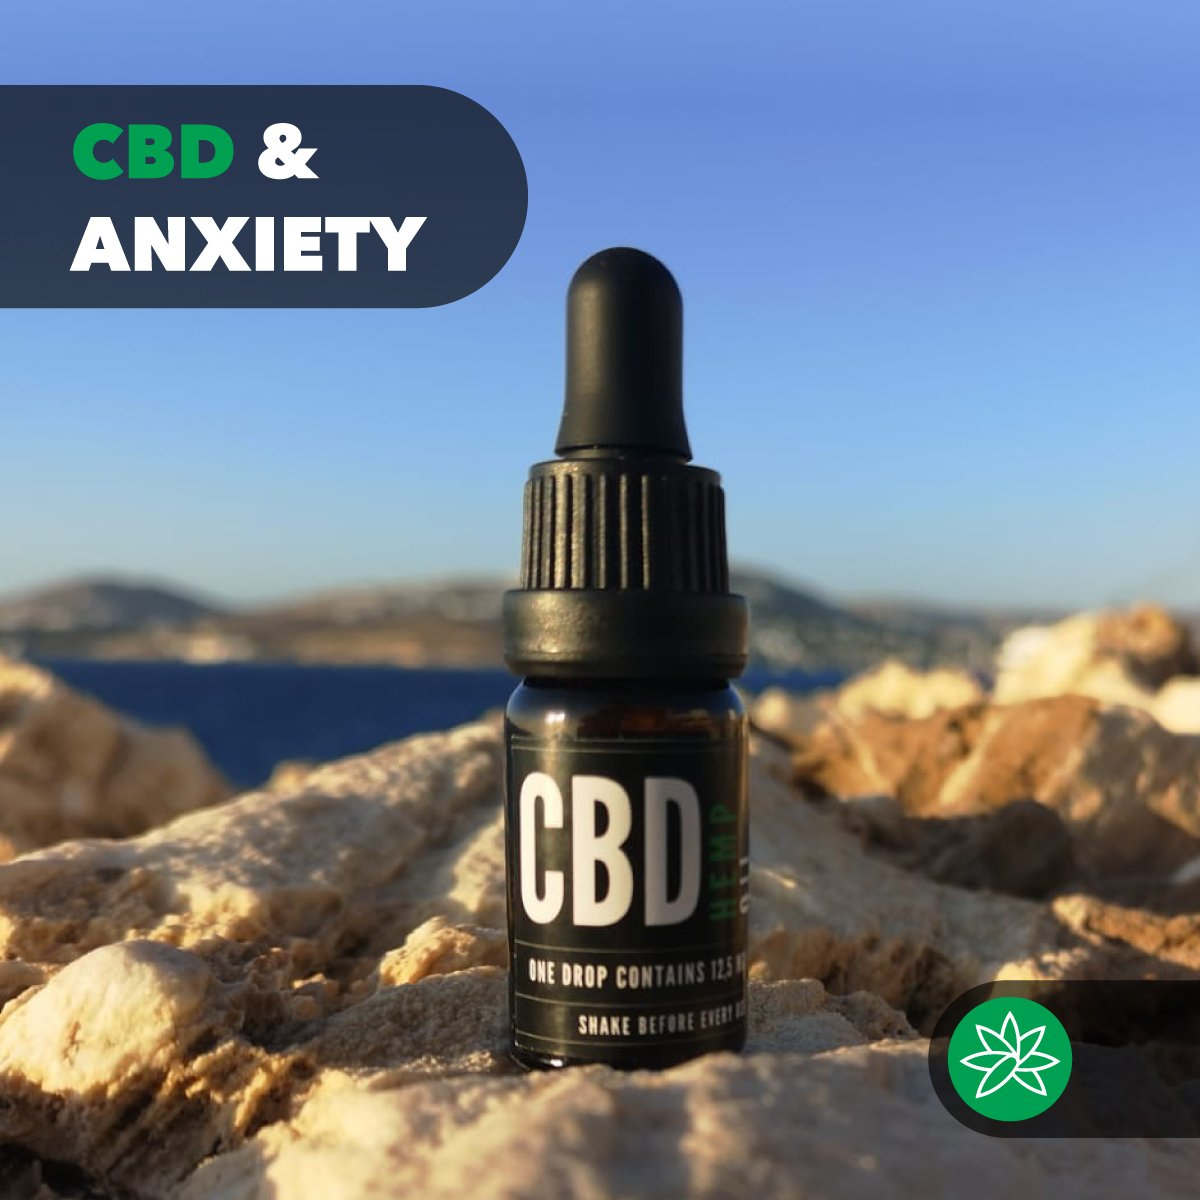 CBD & anxiety